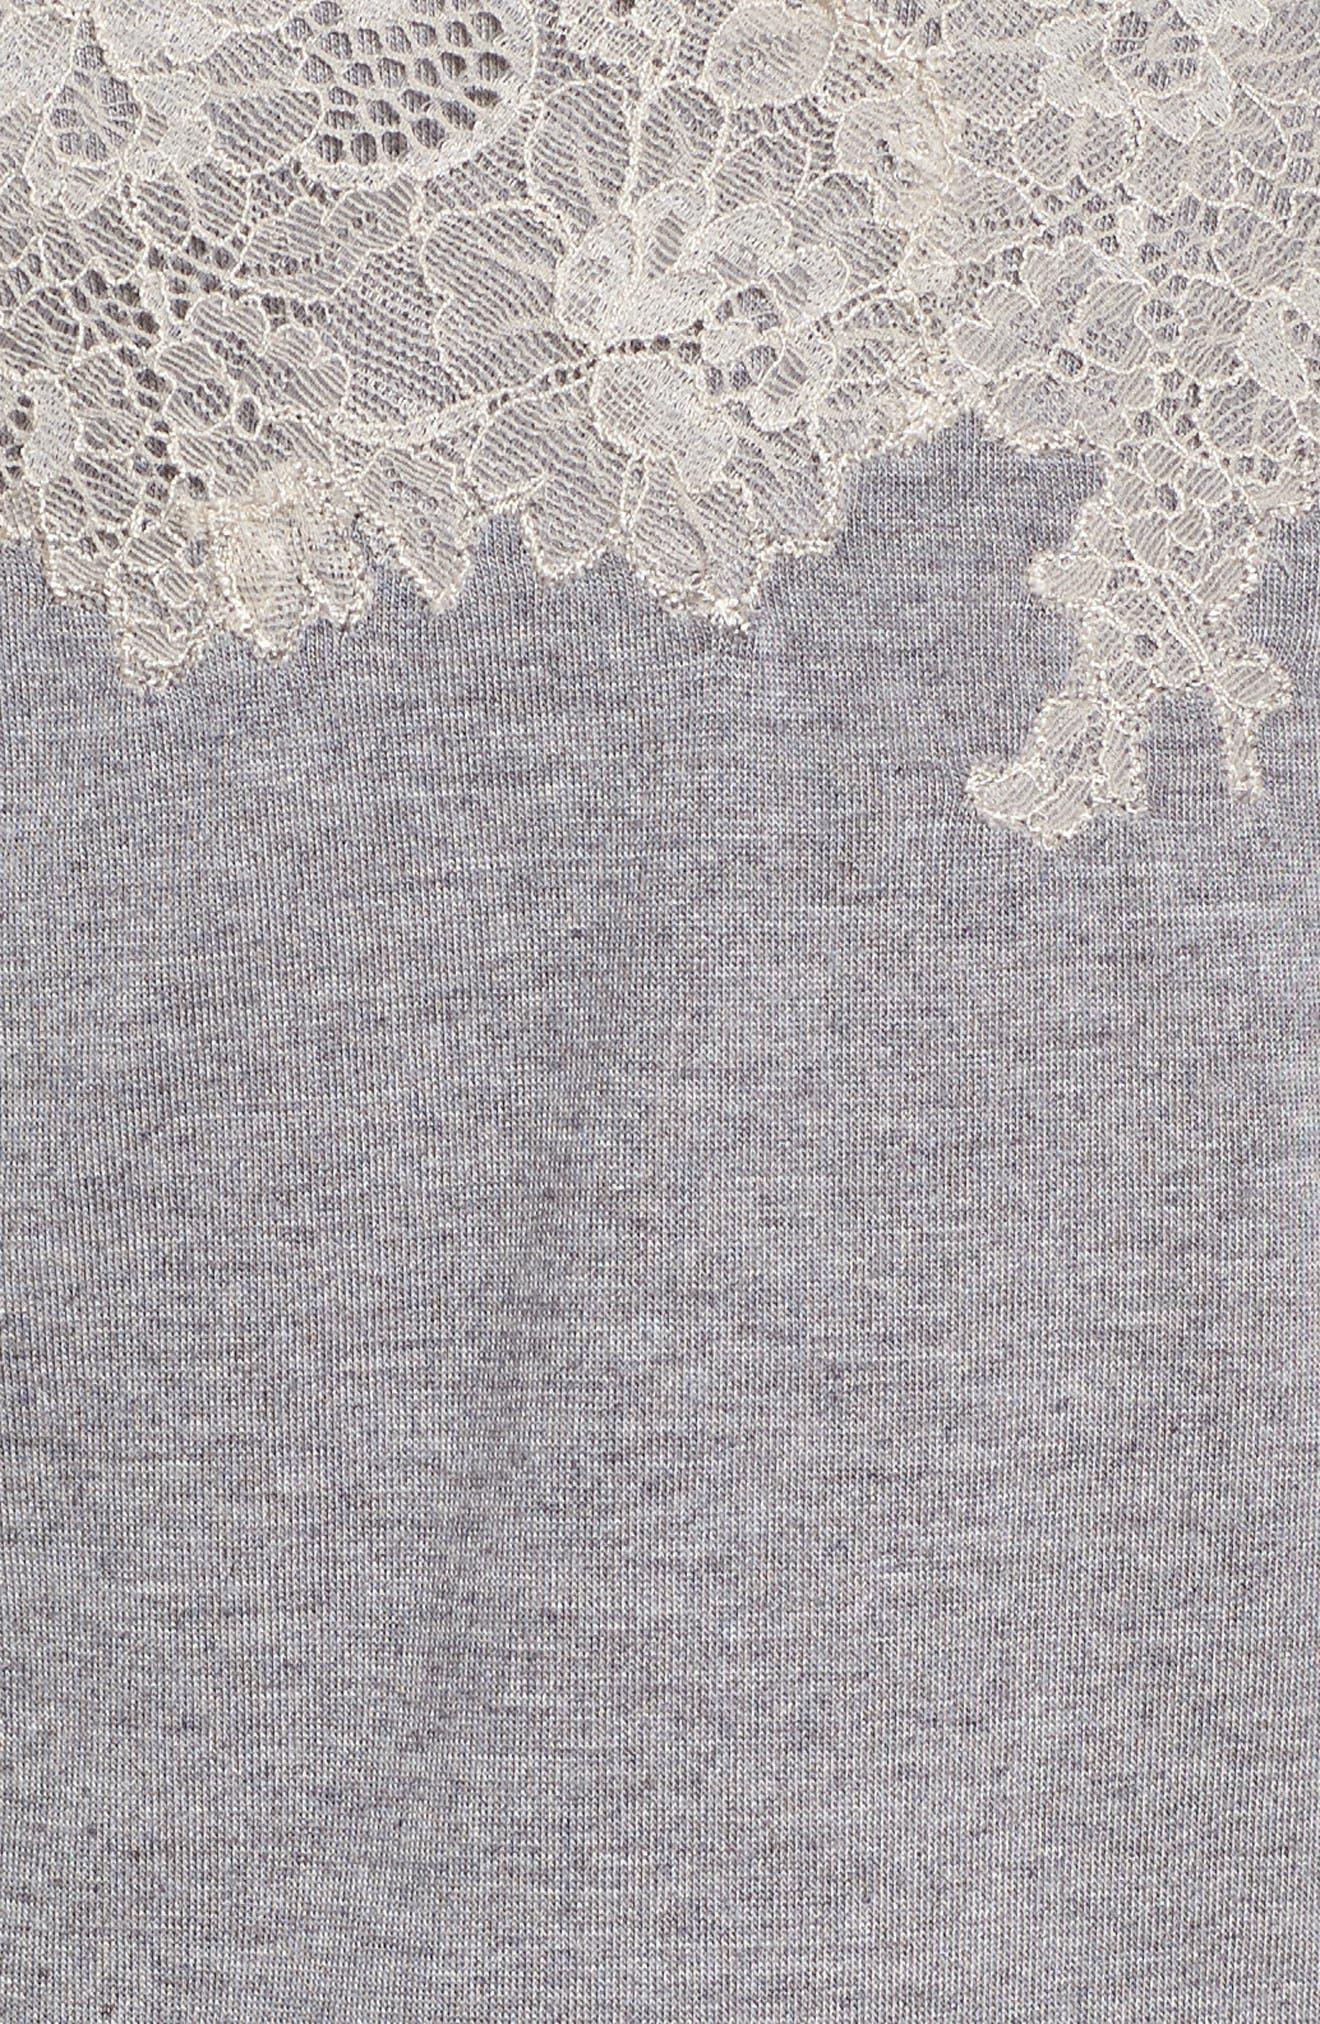 Luxe Shangri-La Short Pajamas,                             Alternate thumbnail 7, color,                             GREY